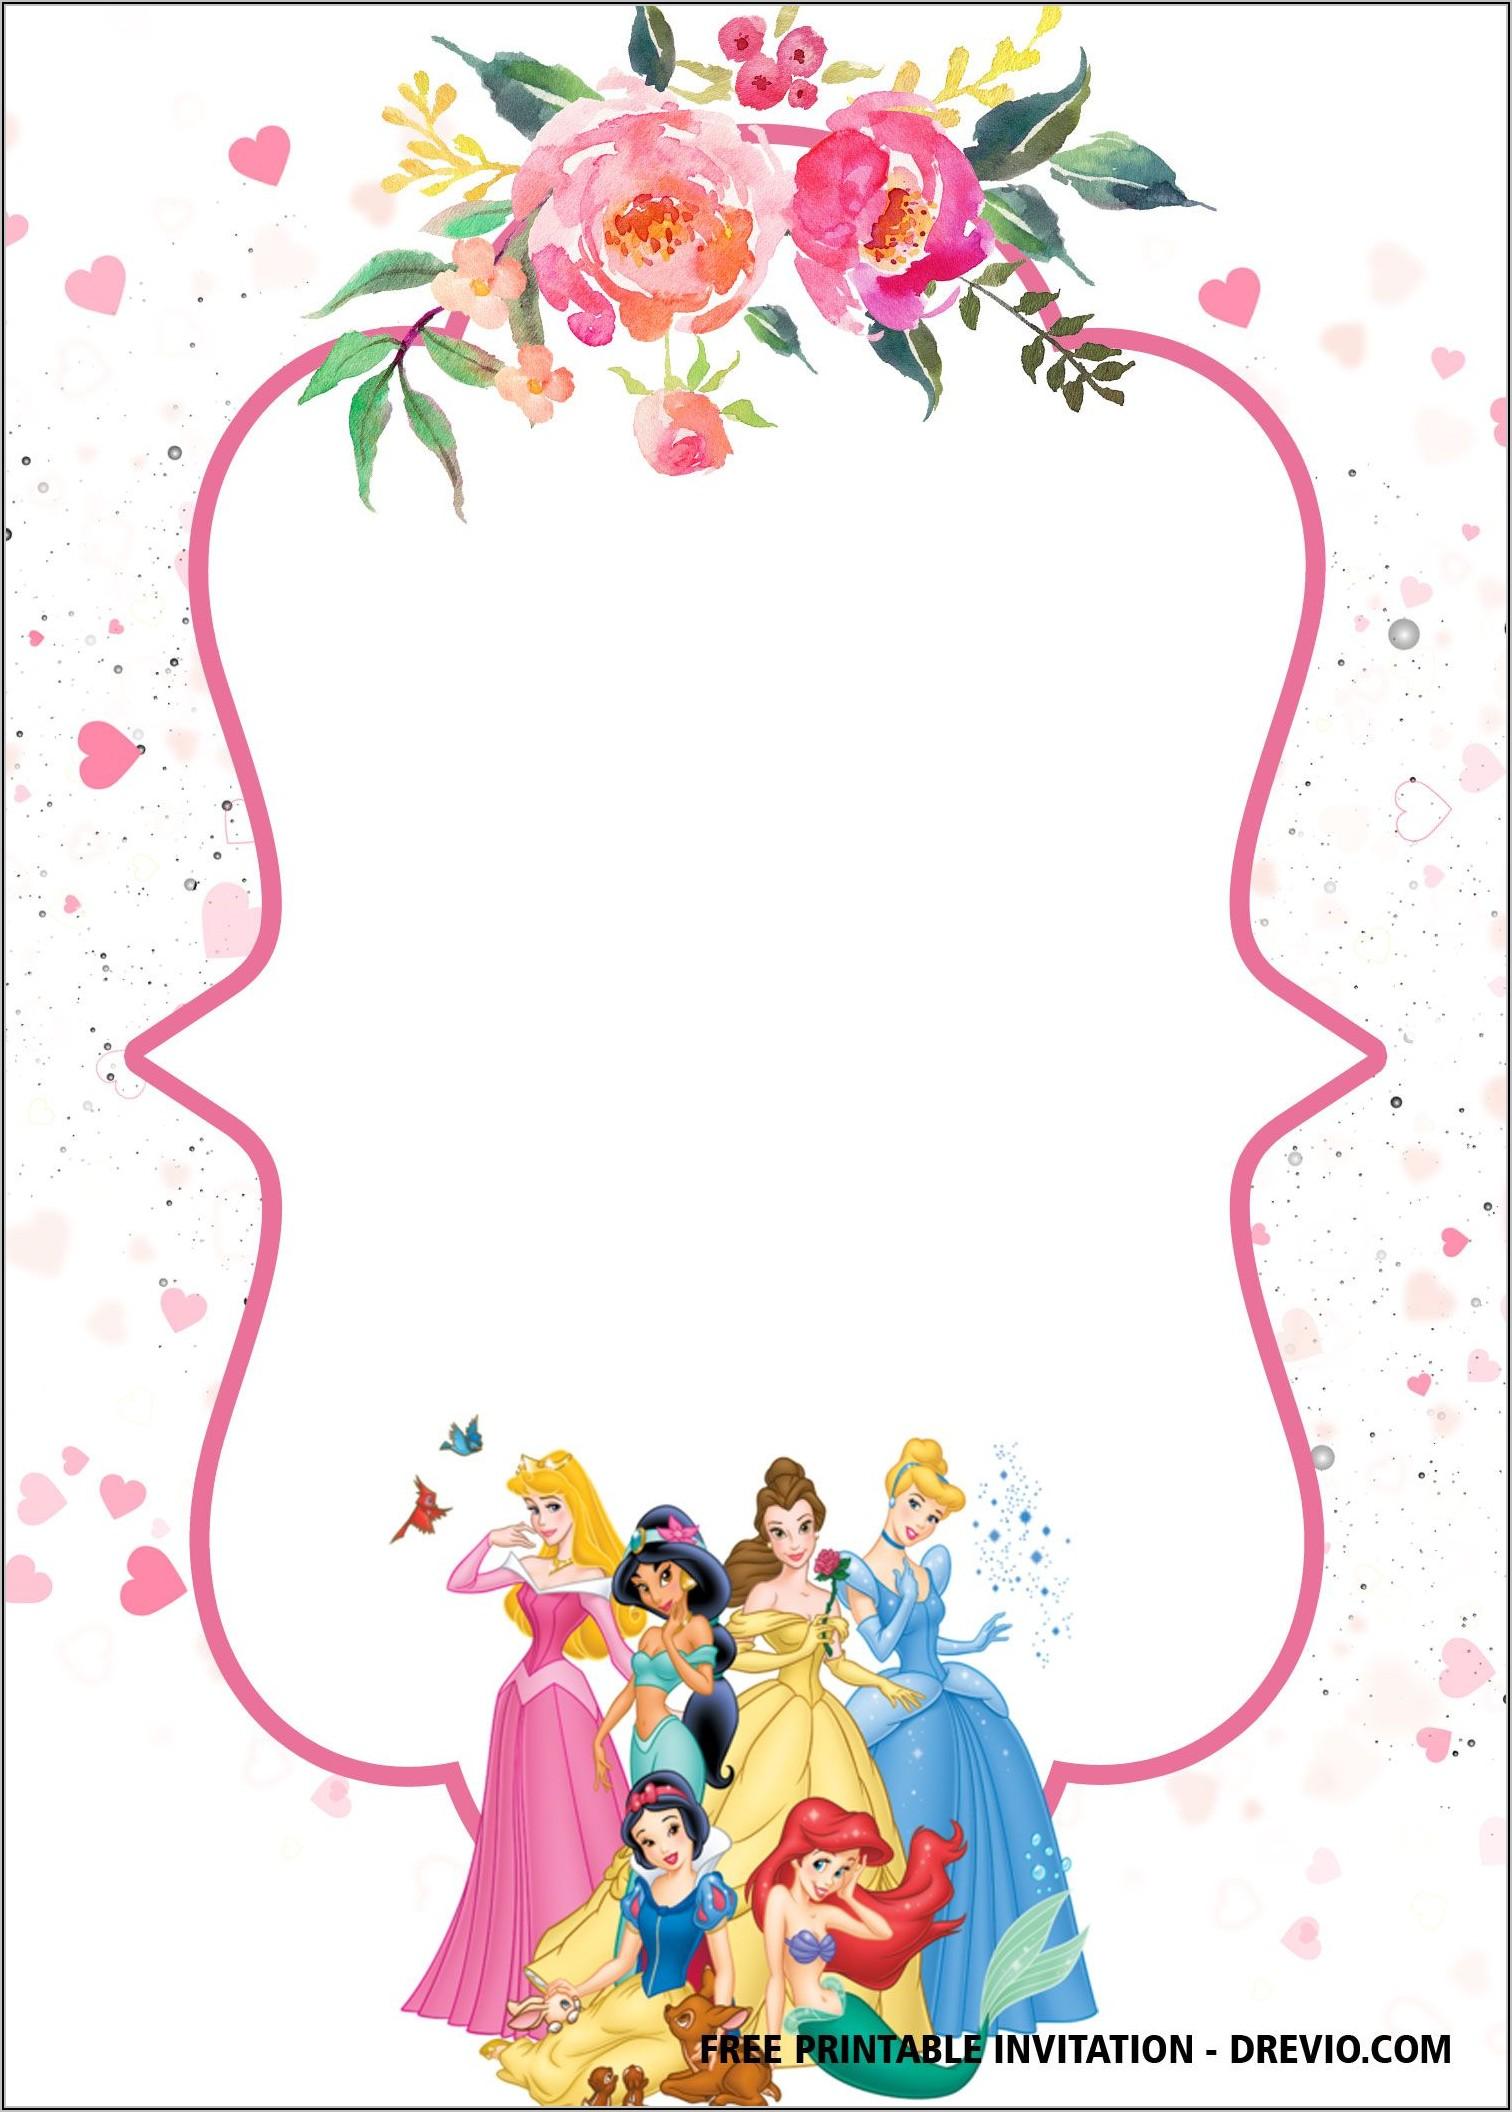 Disney Princess Party Invitation Template